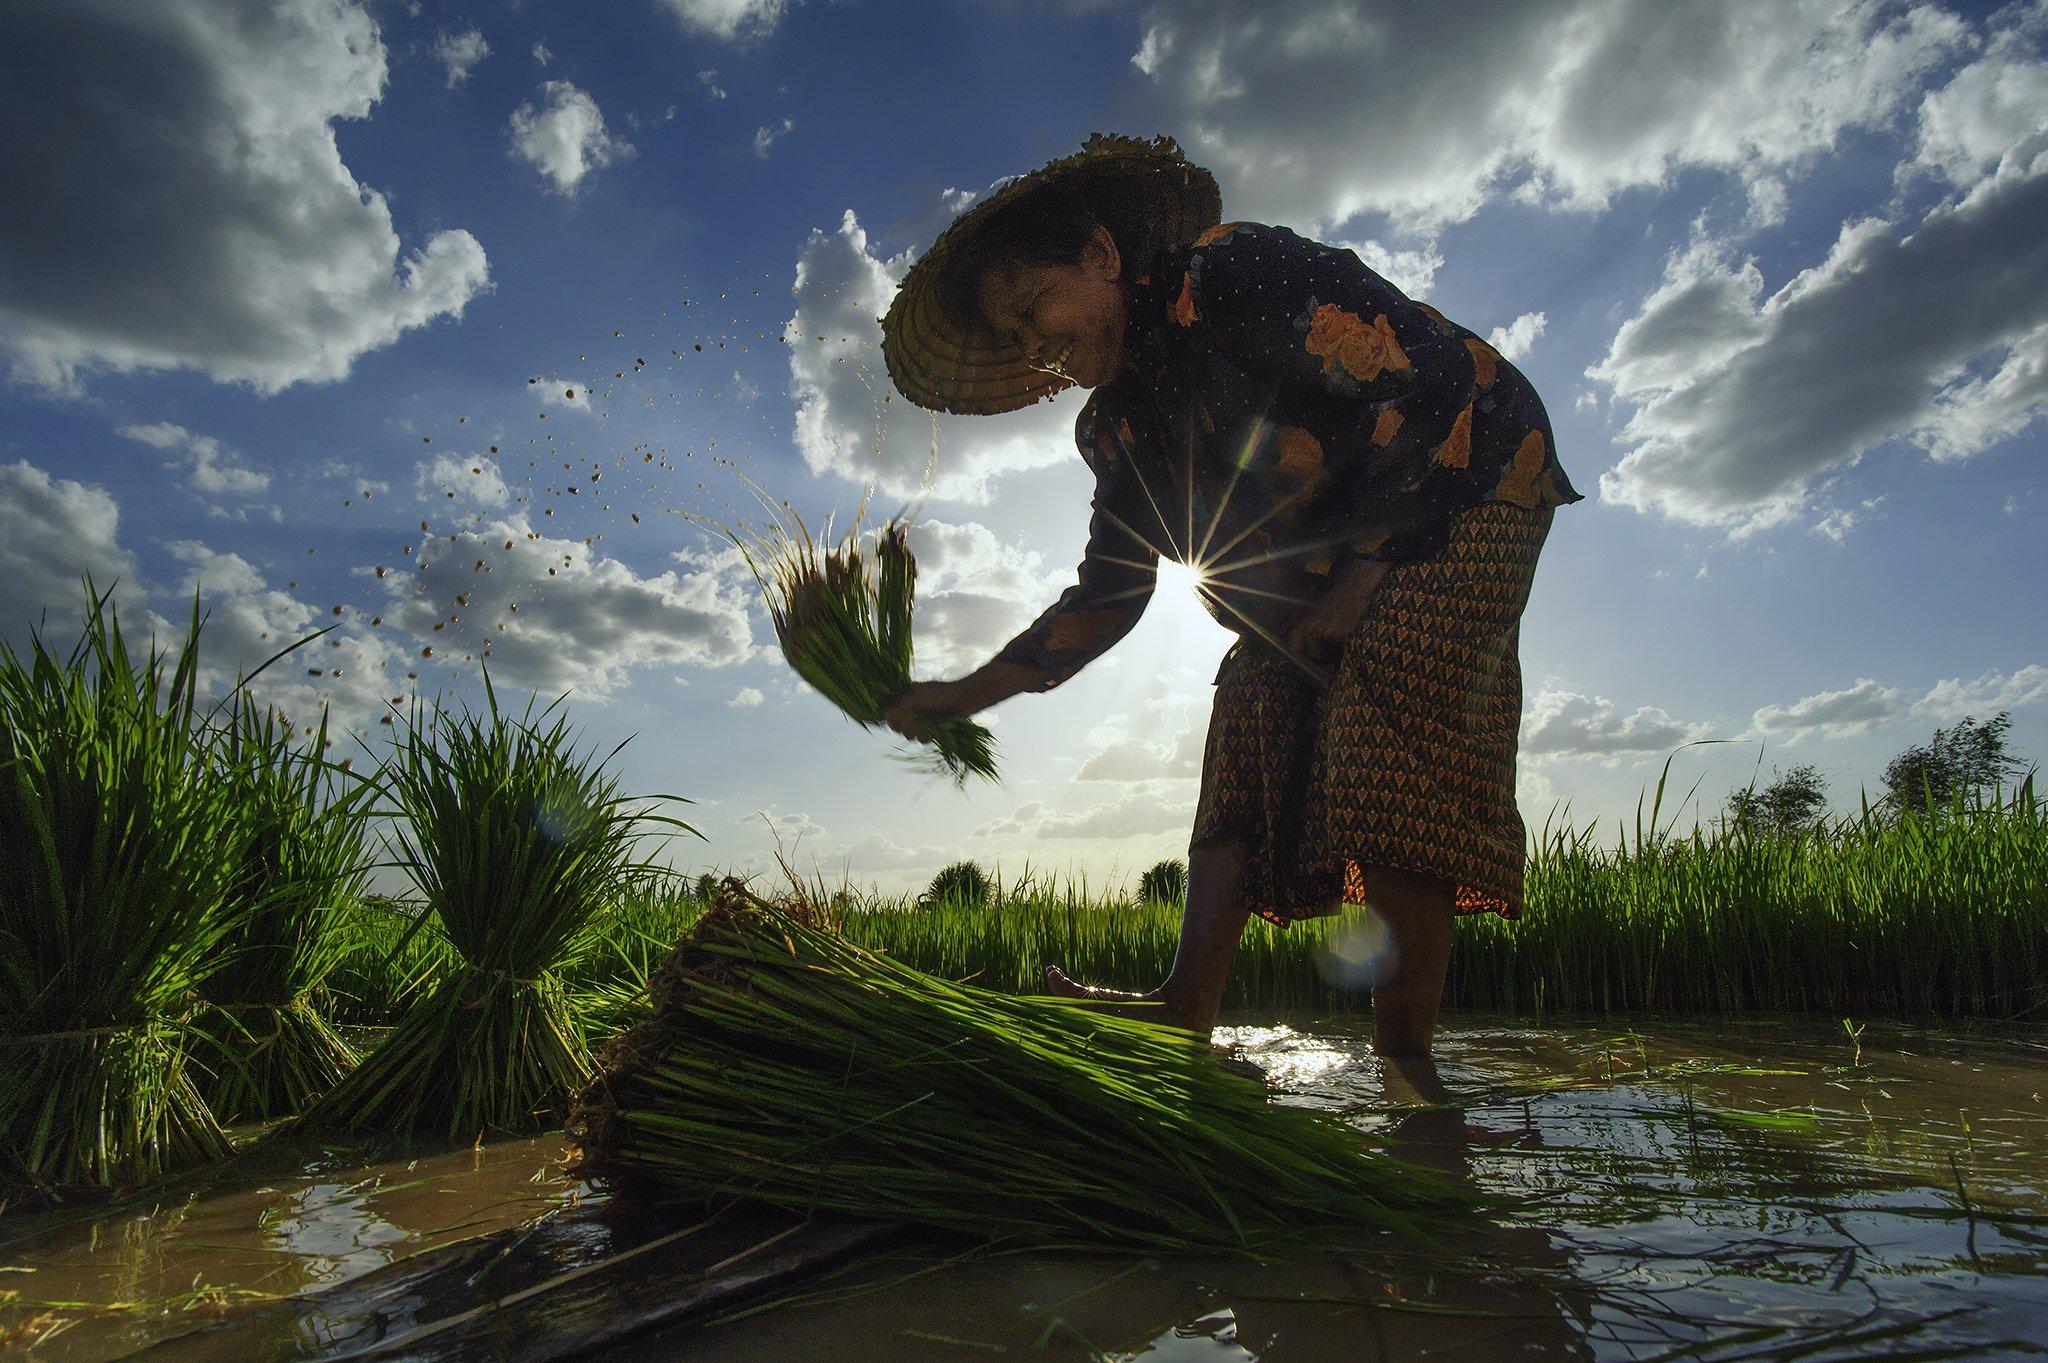 Asia, Asian, Farmer, Green, Light, Paddy, Rice, Sky, Water, Saravut Whanset